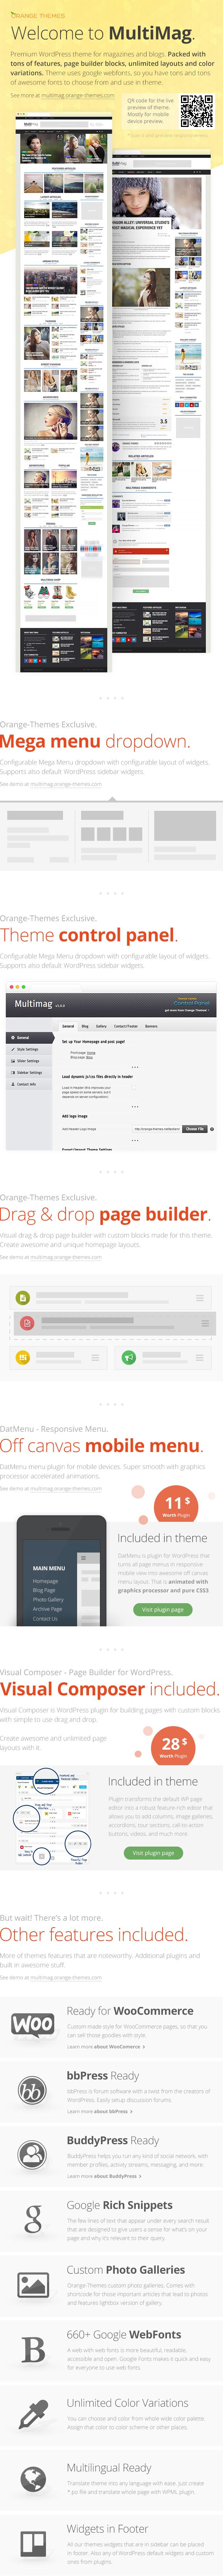 #WordPress #themeforest MultiMag - Multipurpose Magazine Theme  http://sumo.ly/4ytP